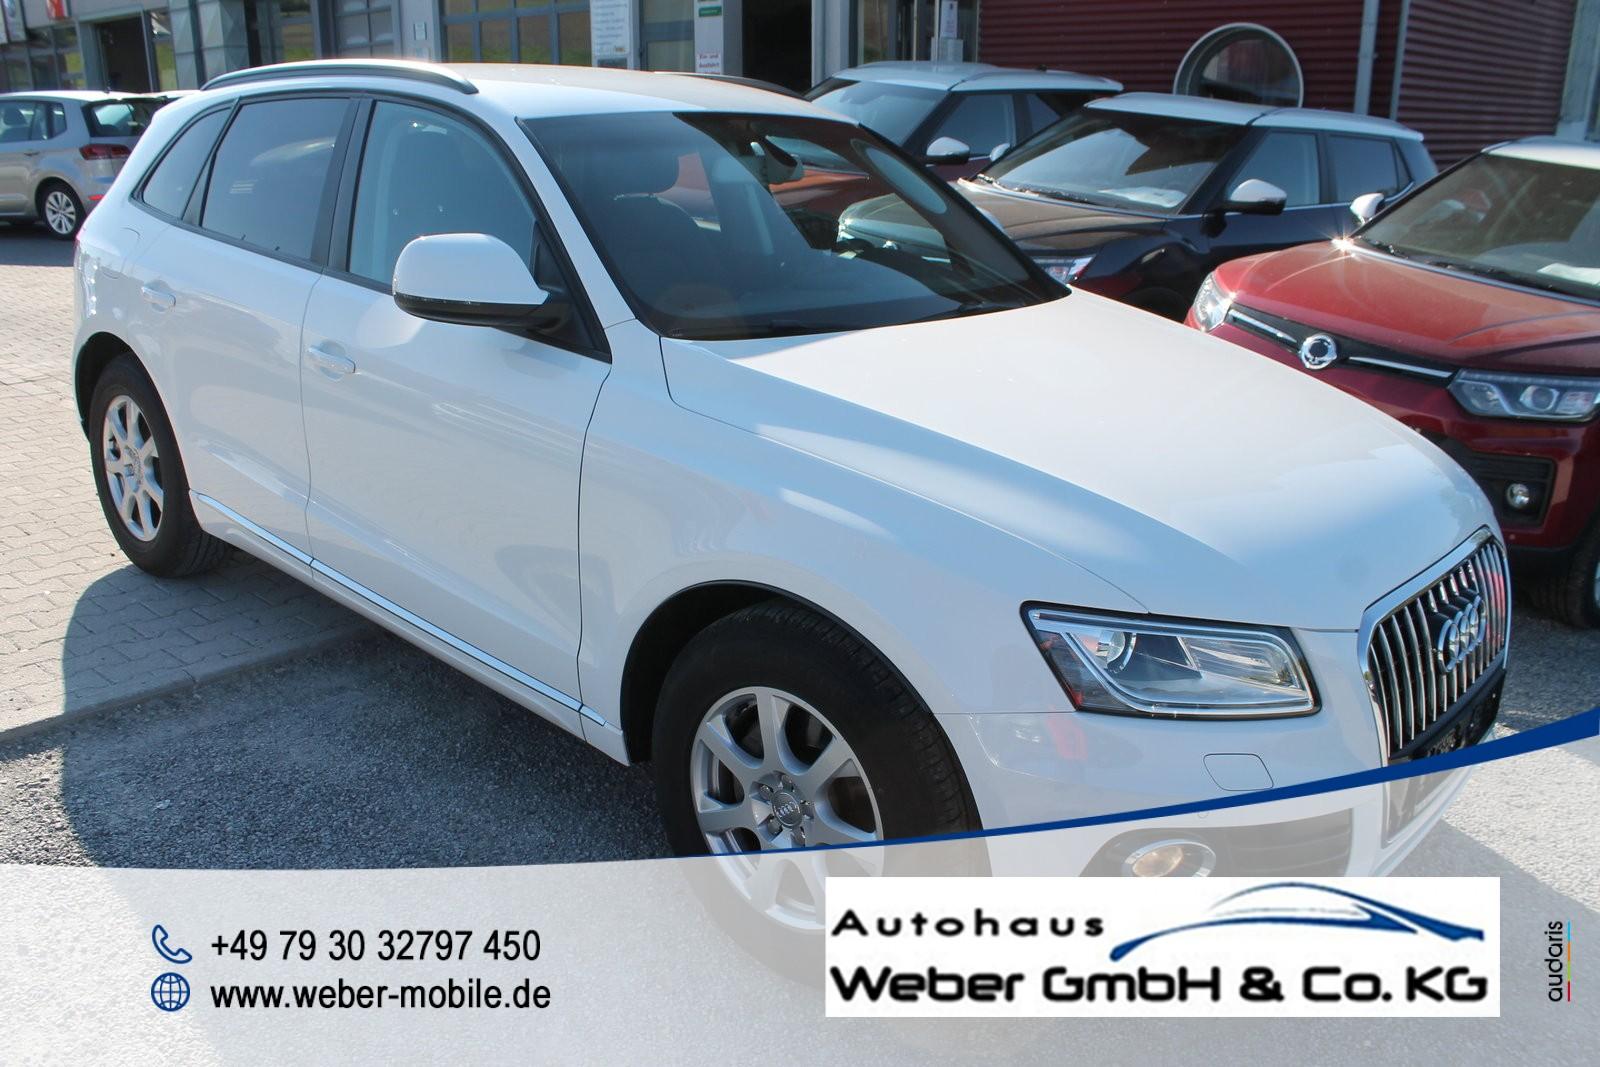 Audi Q5 2.0 TDI *Einparkhilfe*AHK*Navi*SHZ*Tempomat*Dachreling*, Jahr 2014, Diesel